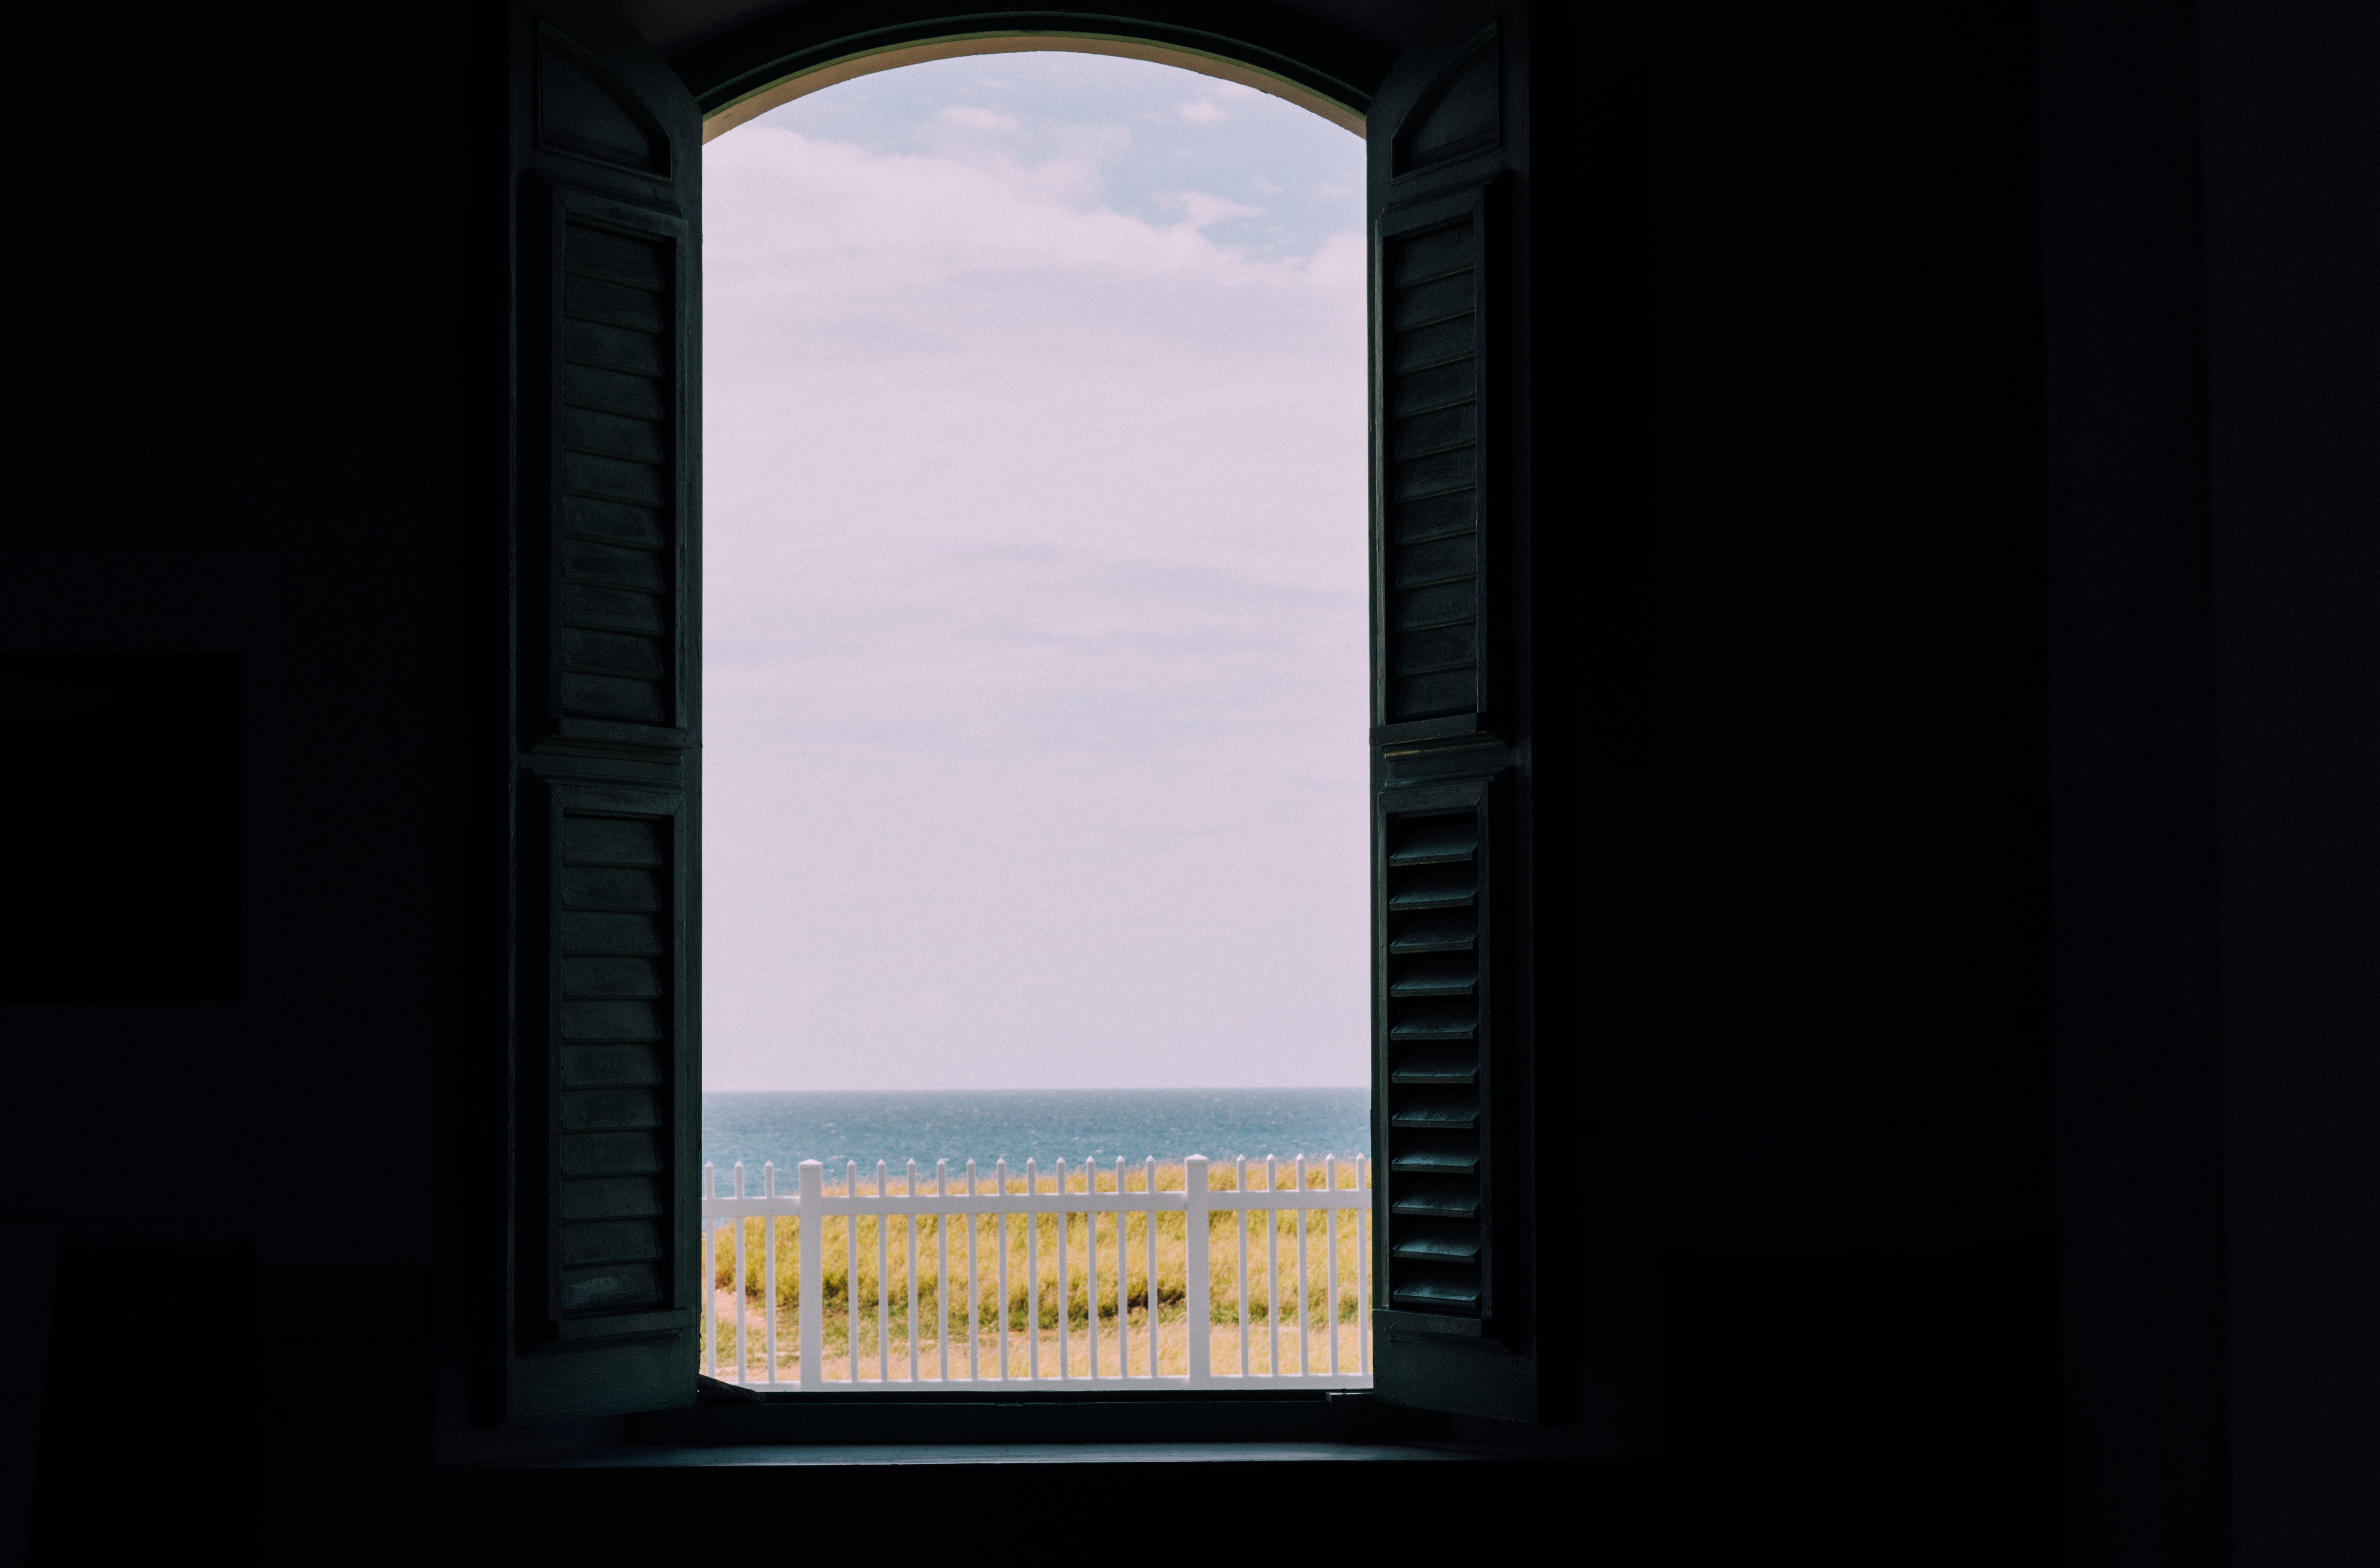 White Window Open at Daytime